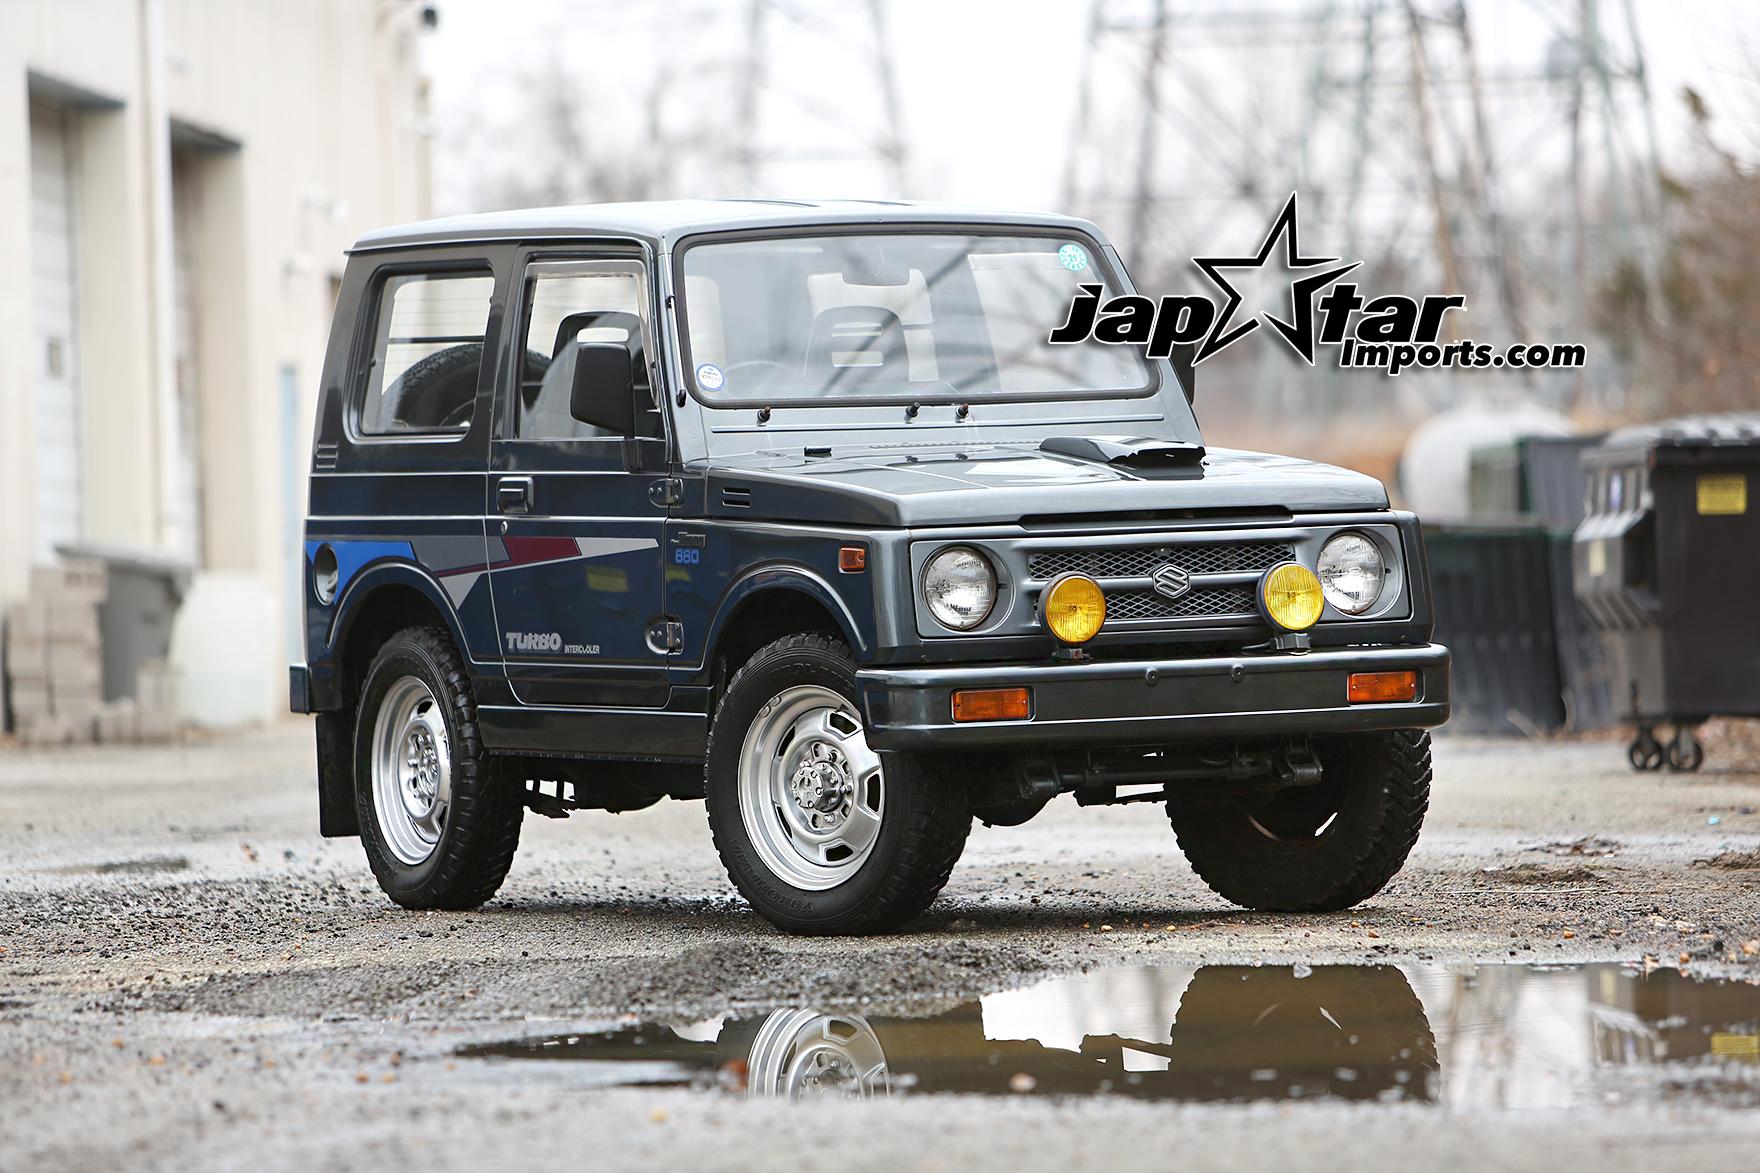 1990 Suzuki Jimny - SOLD